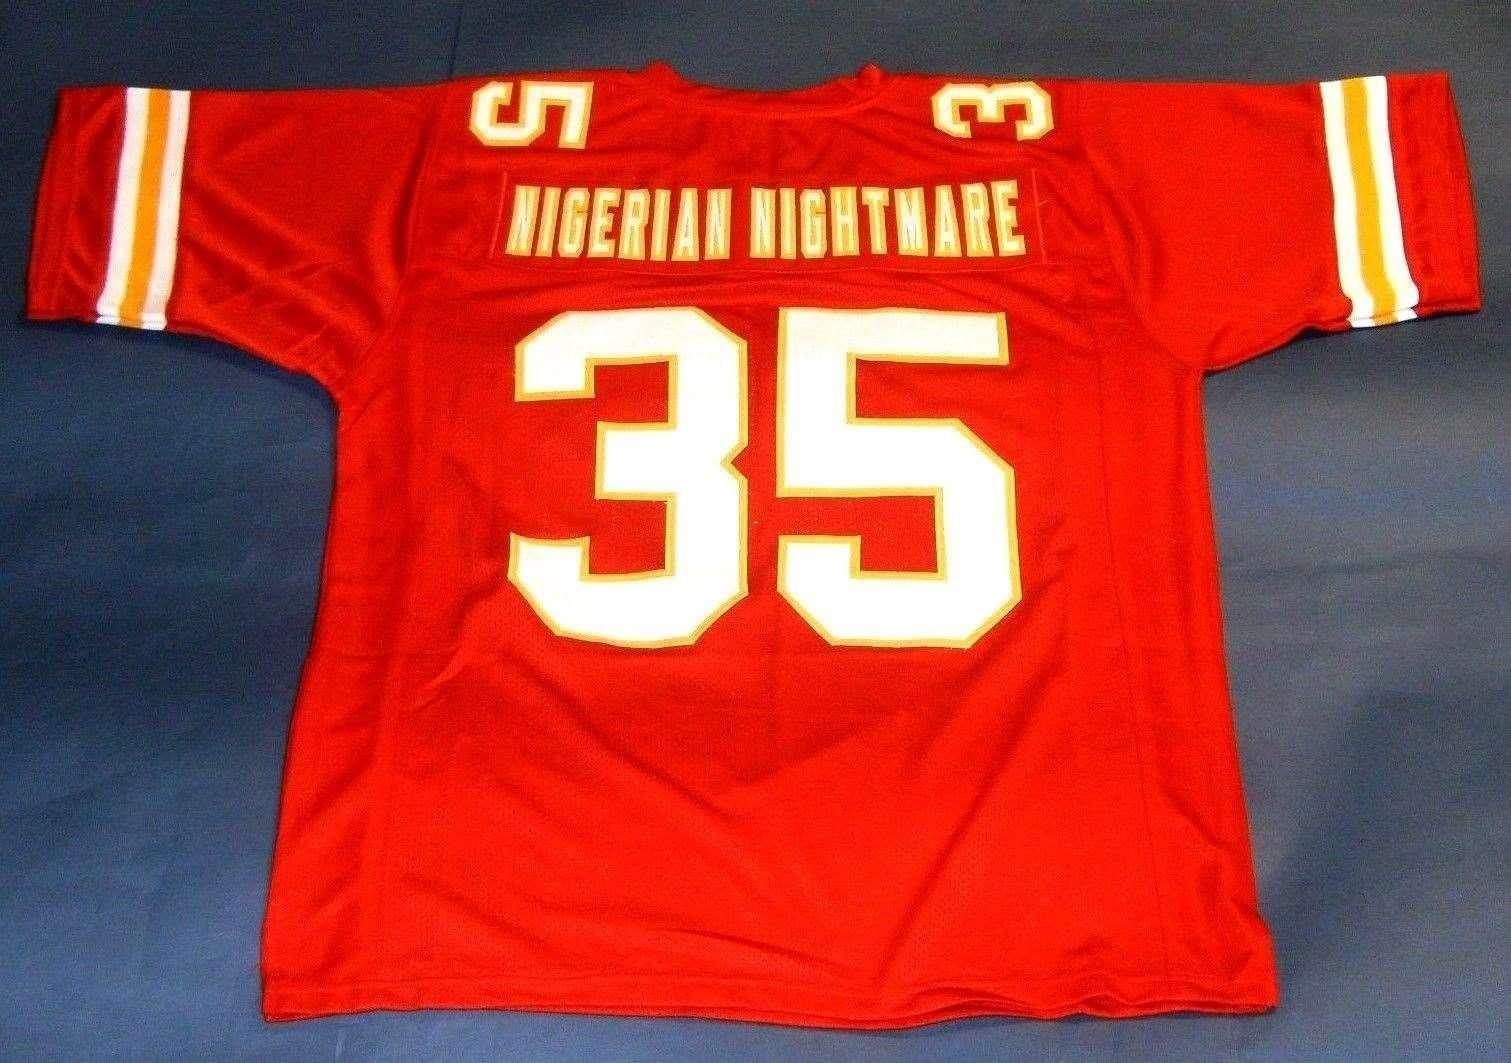 Ness Mitchell Okoye High-end Christian Retro Cheap Nightmare Football Jerseys Size Jersey 35 College S-5xl Nigerian Stitching amp; Mens Custom